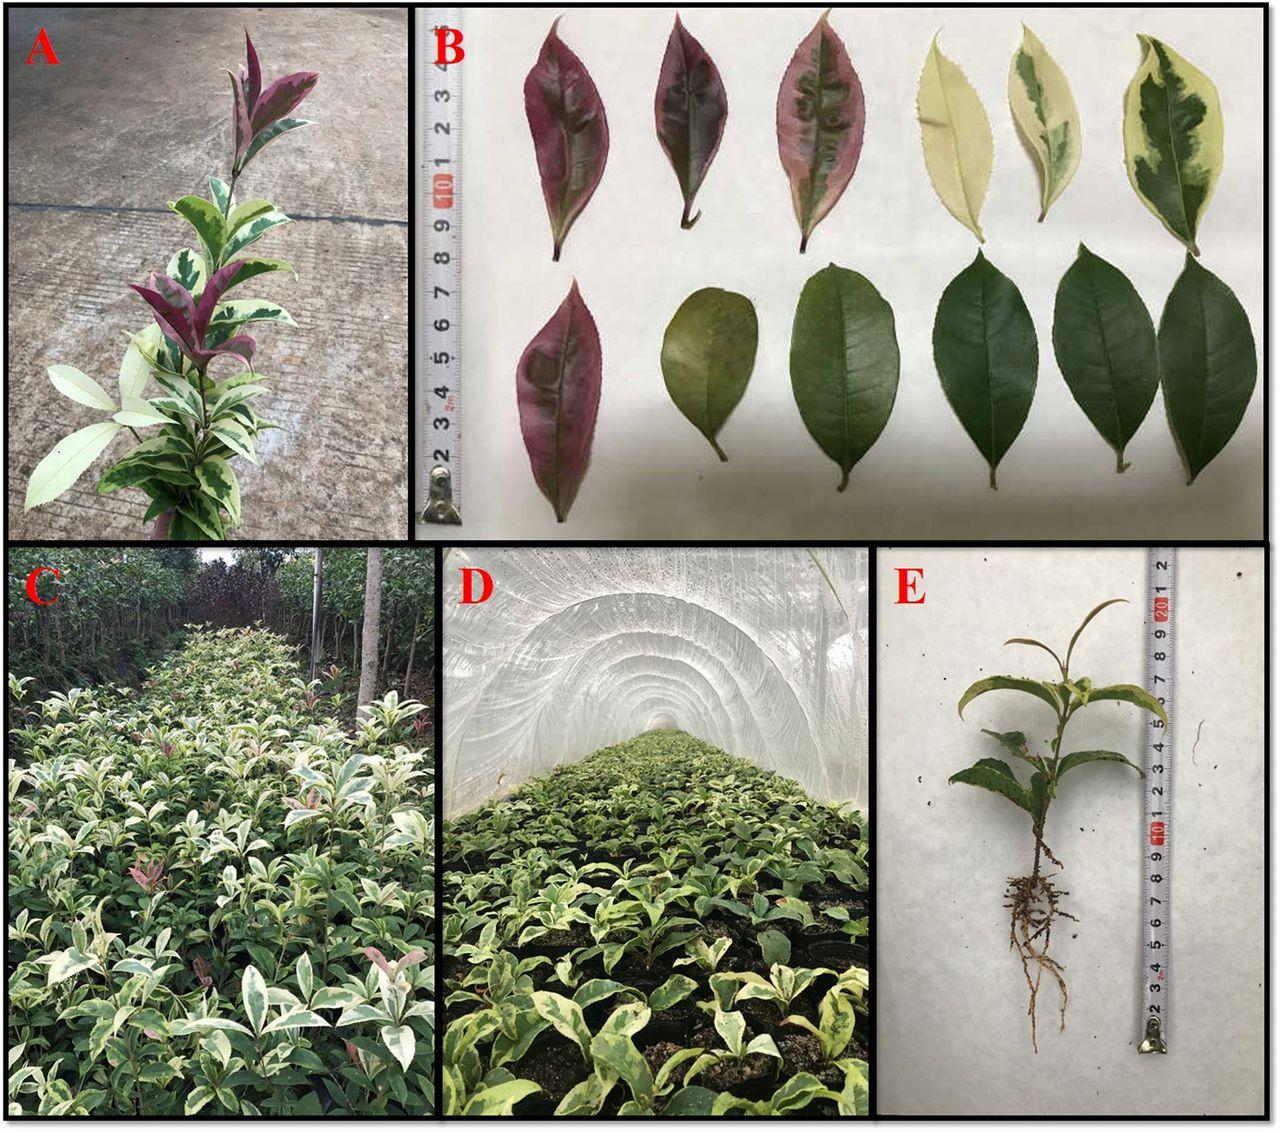 e62f555e3 Osmanthus fragrans 'Cai Ye Gui', a Variegated Cultivar in ...